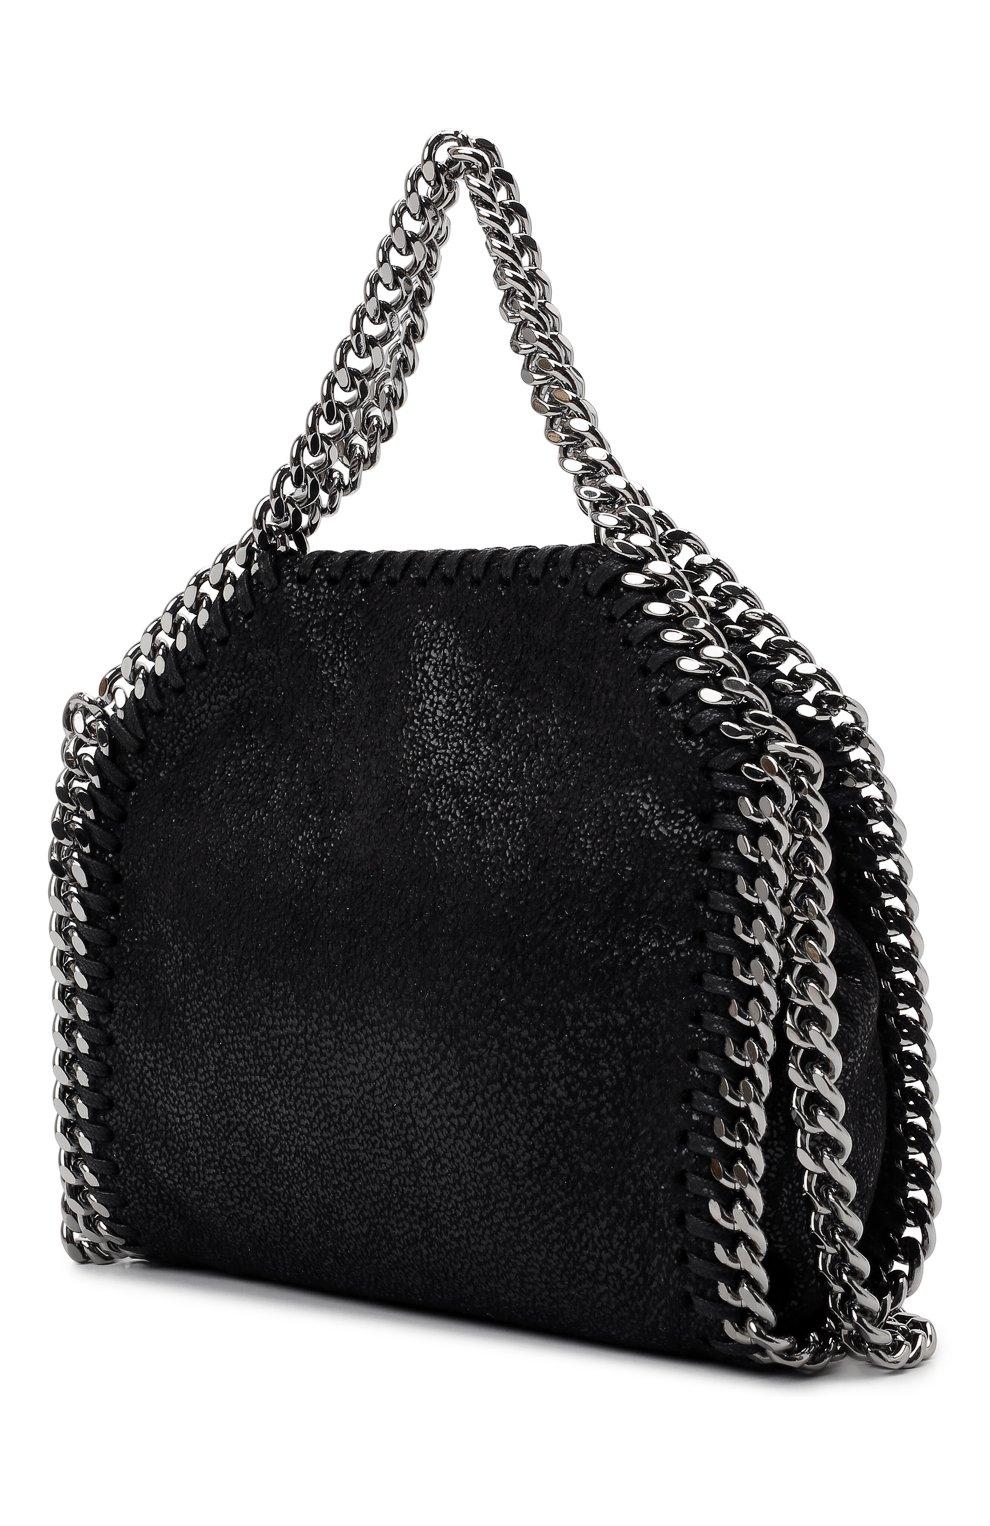 Женская сумка falabella STELLA MCCARTNEY черного цвета, арт. 700227/W9132   Фото 3 (Ремень/цепочка: С цепочкой; Сумки-технические: Сумки top-handle; Размер: mini; Материал: Текстиль)